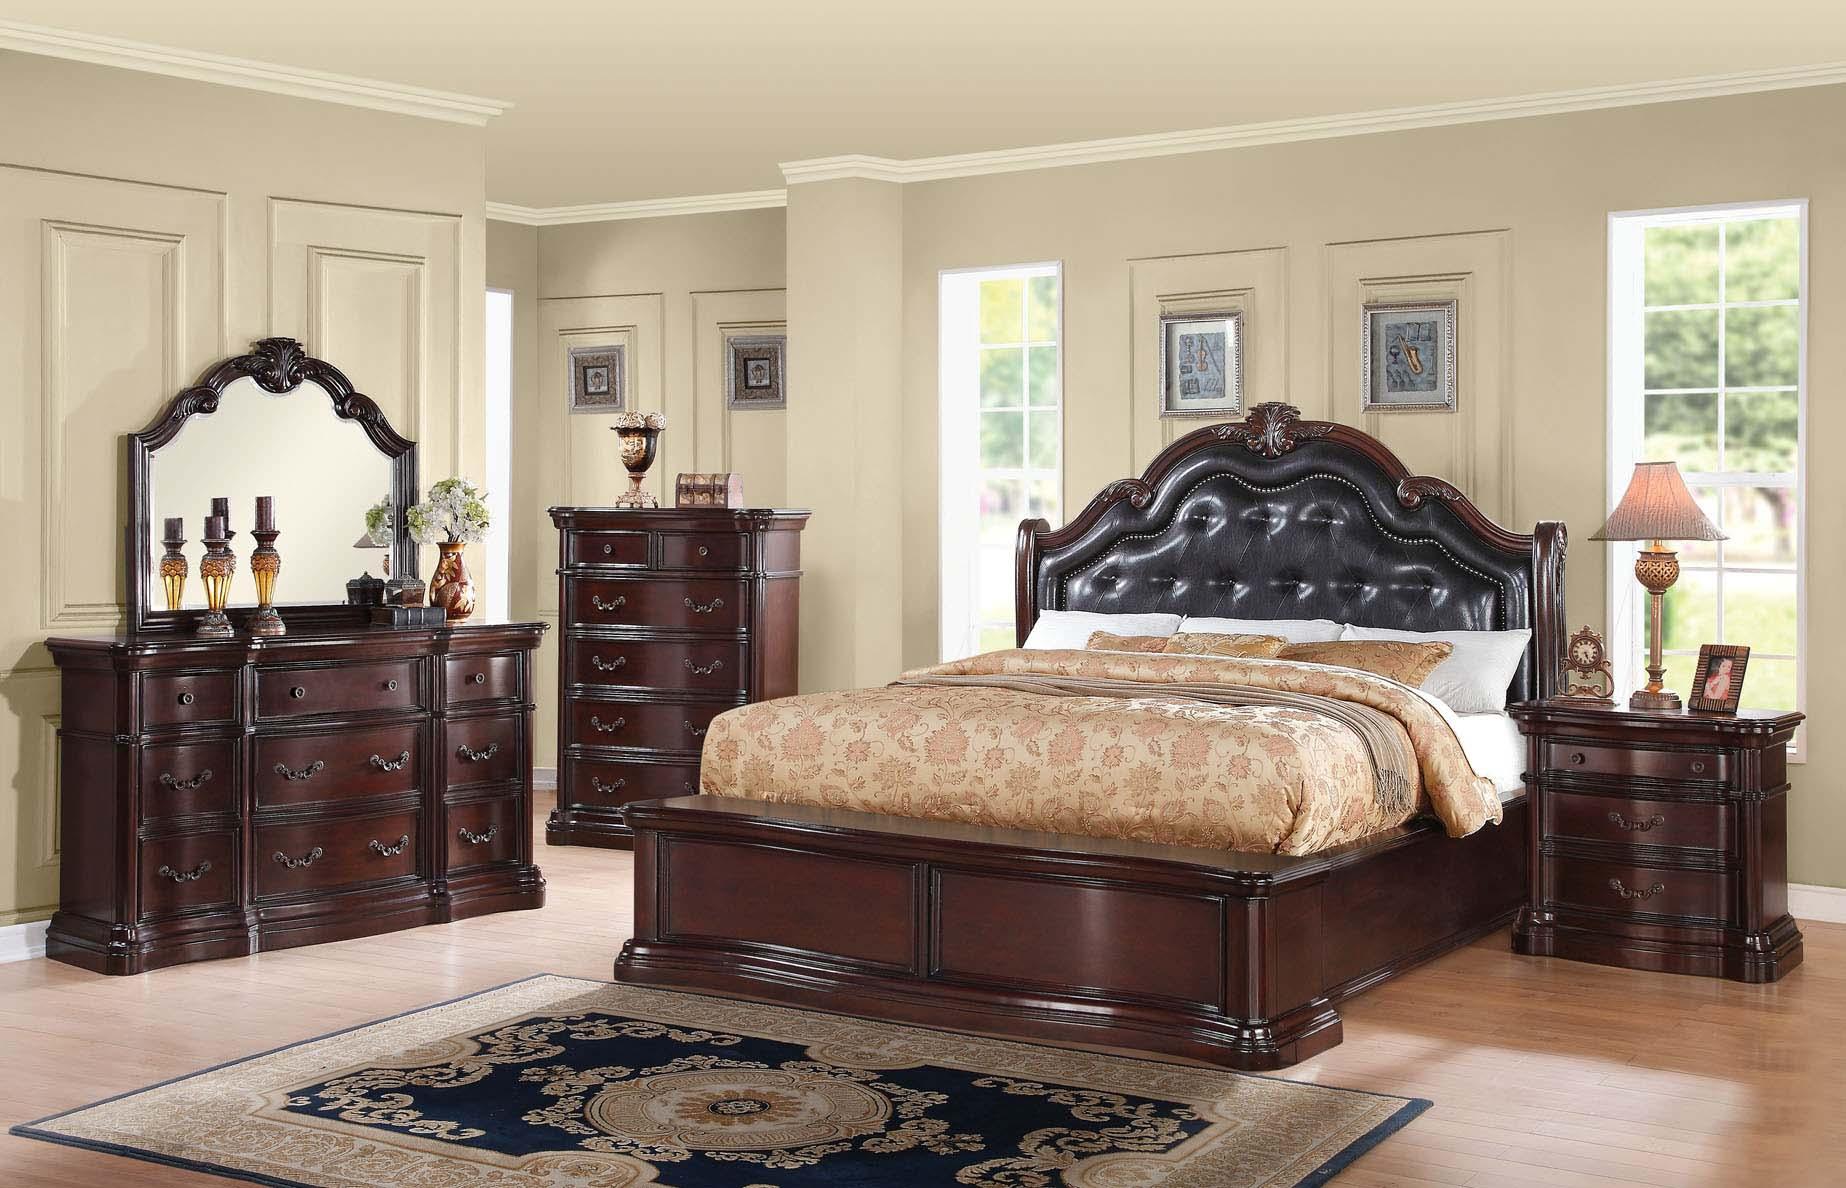 Bedroom Set Veradisia Collection Dark Cherry Finish Black